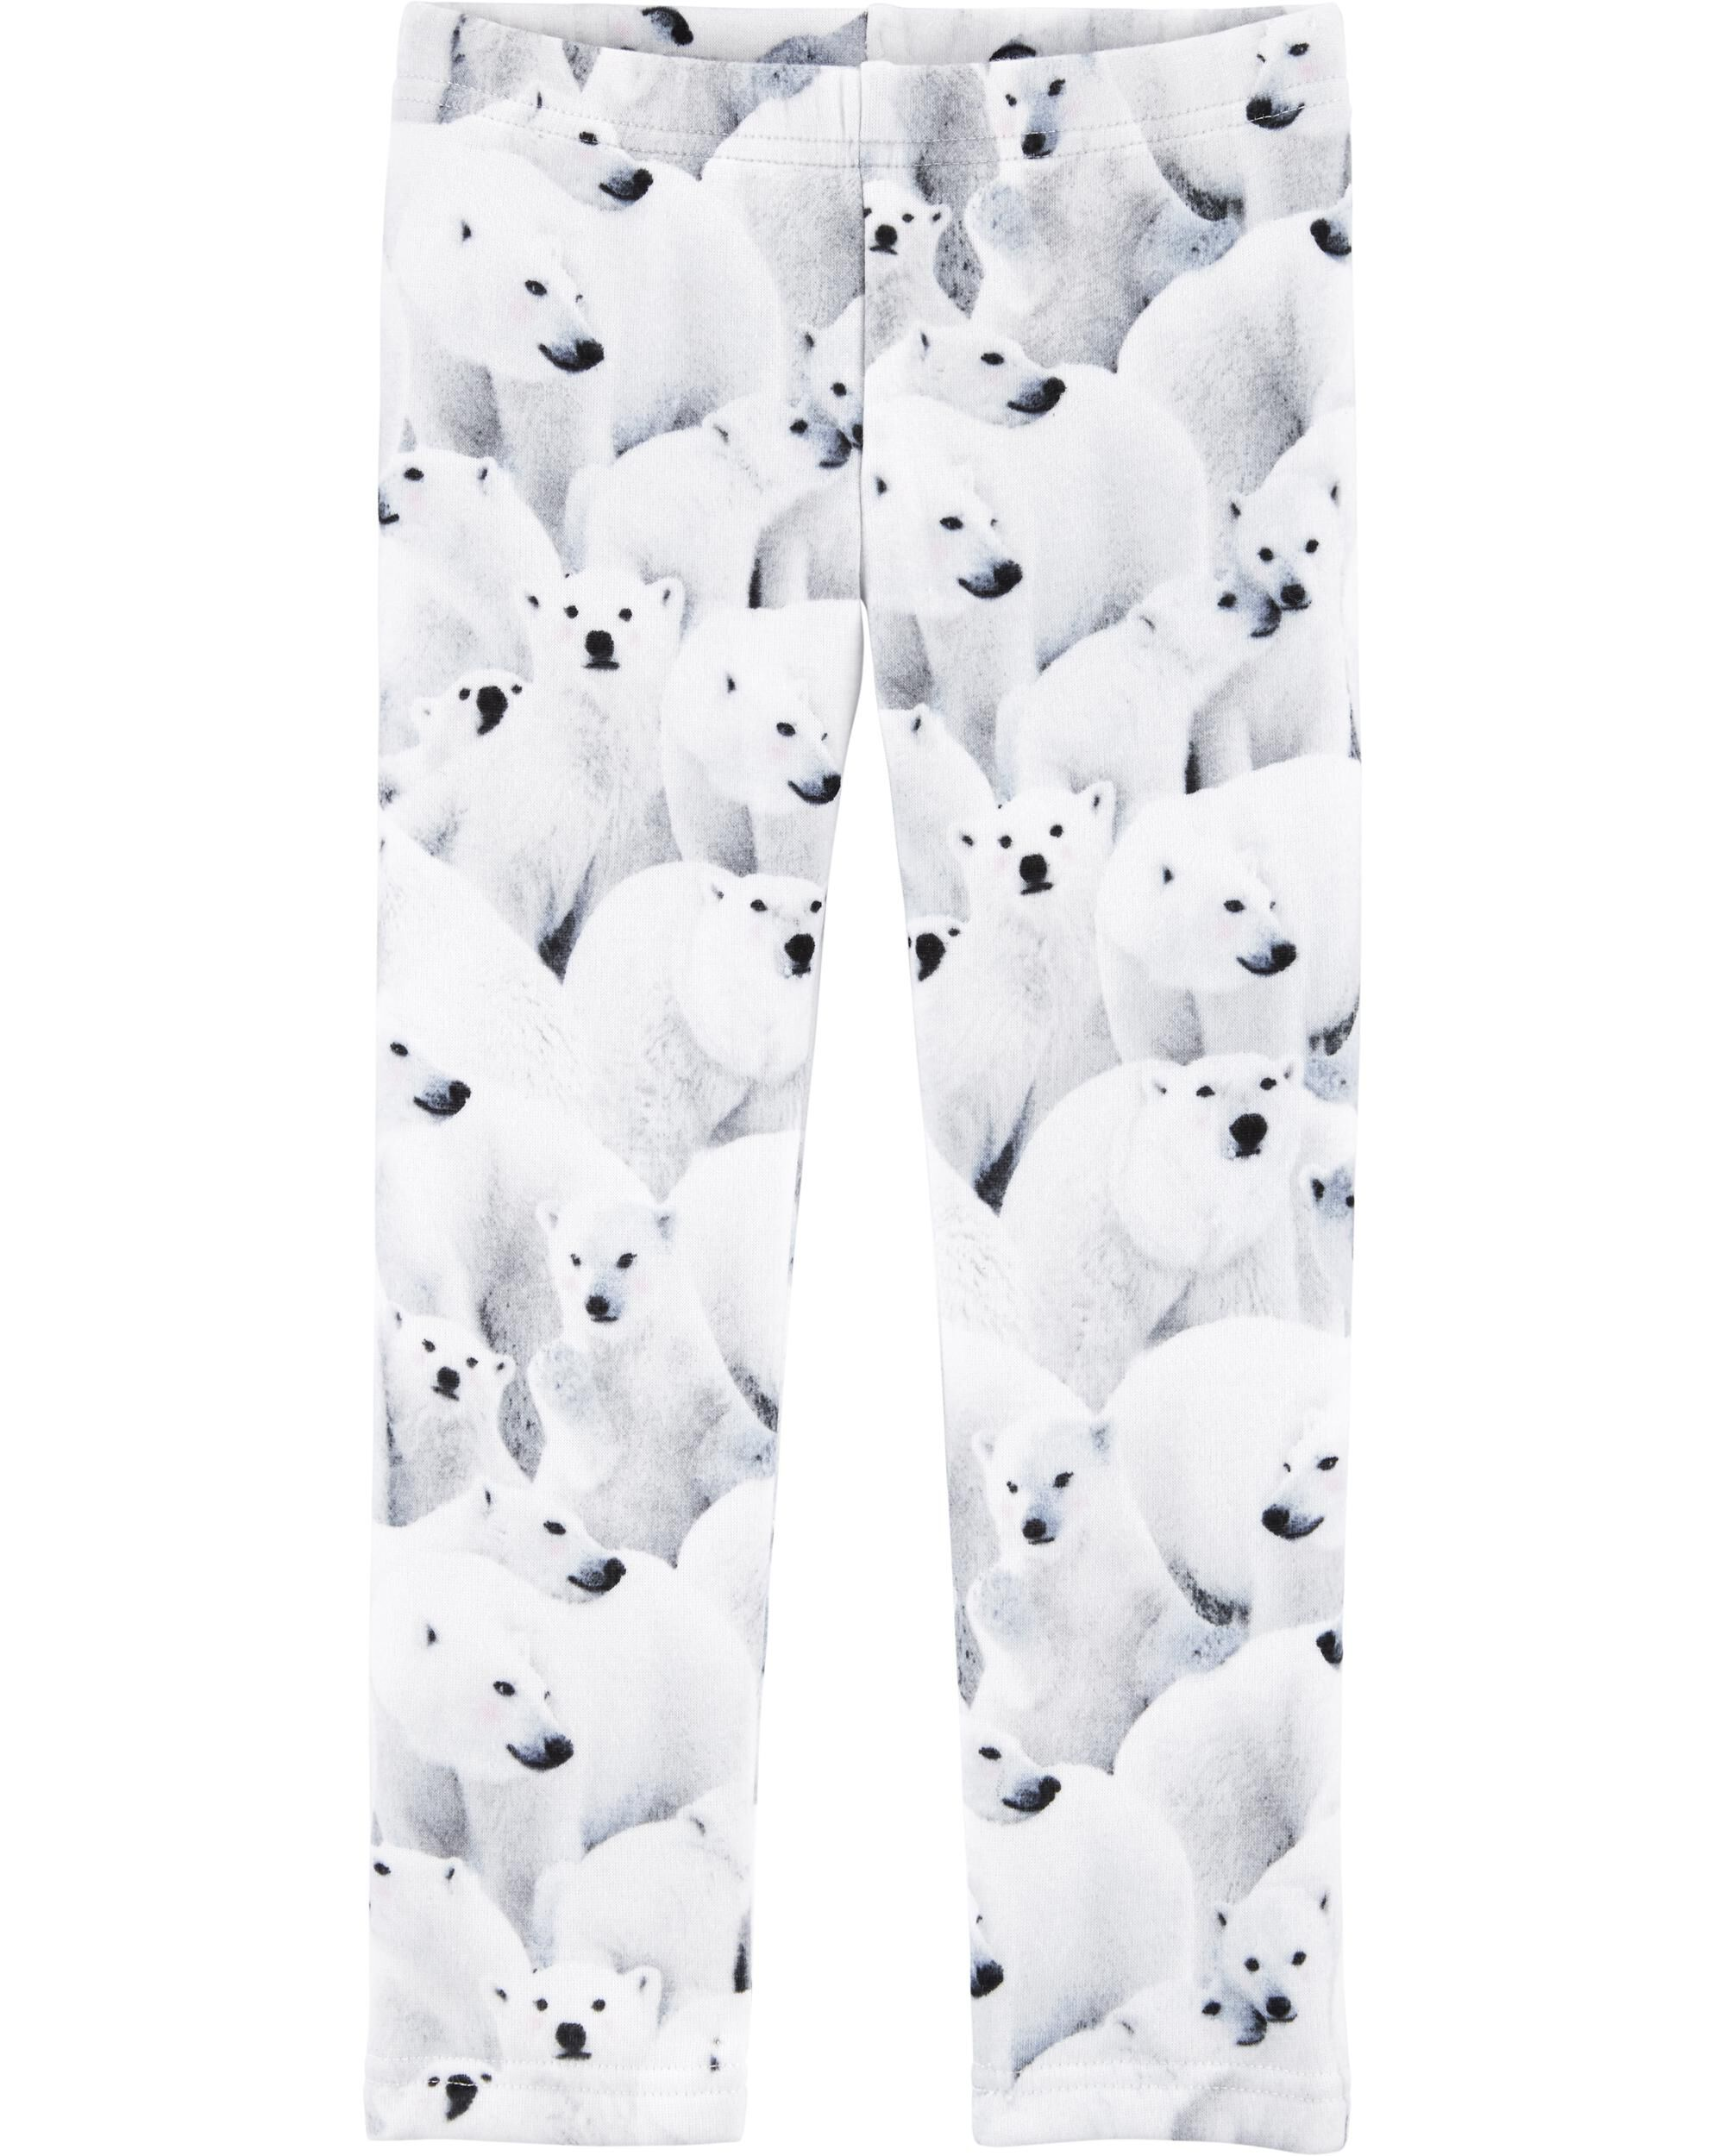 *CLEARANCE* Polar Bear Cozy Fleece Leggings